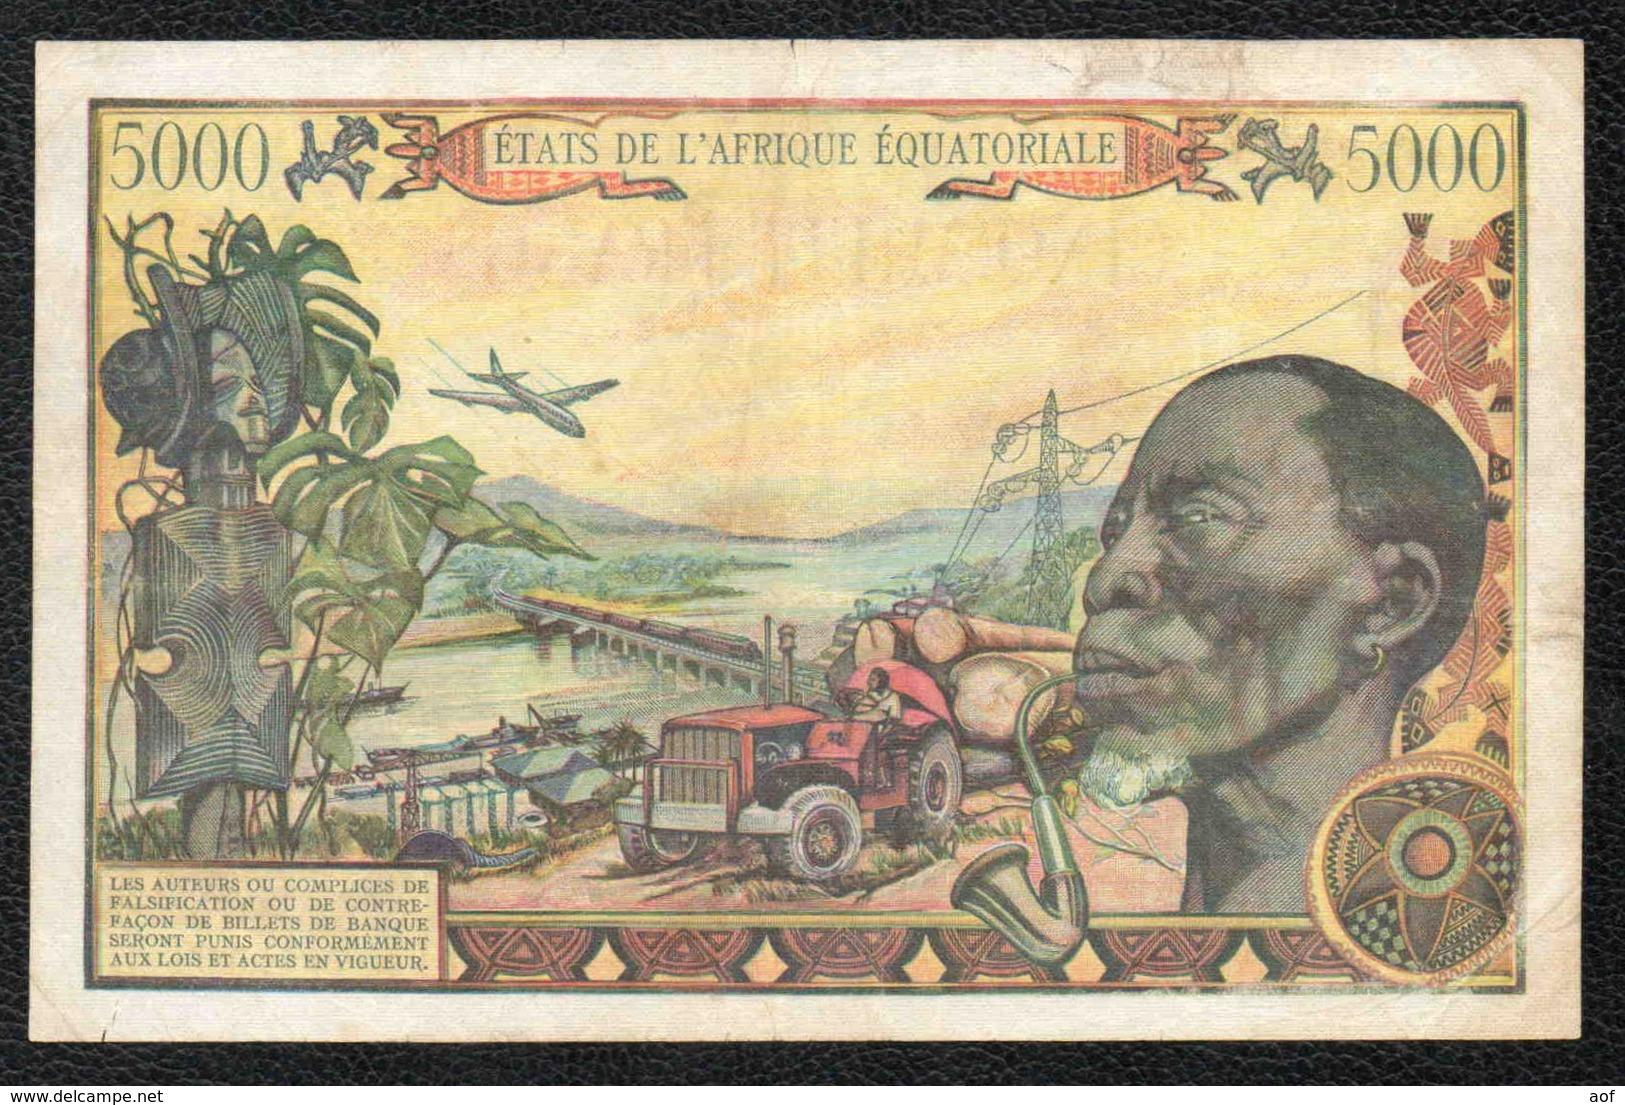 5000F BANQUE CENTRALE - CENTRAFRIQUE - Central African Republic